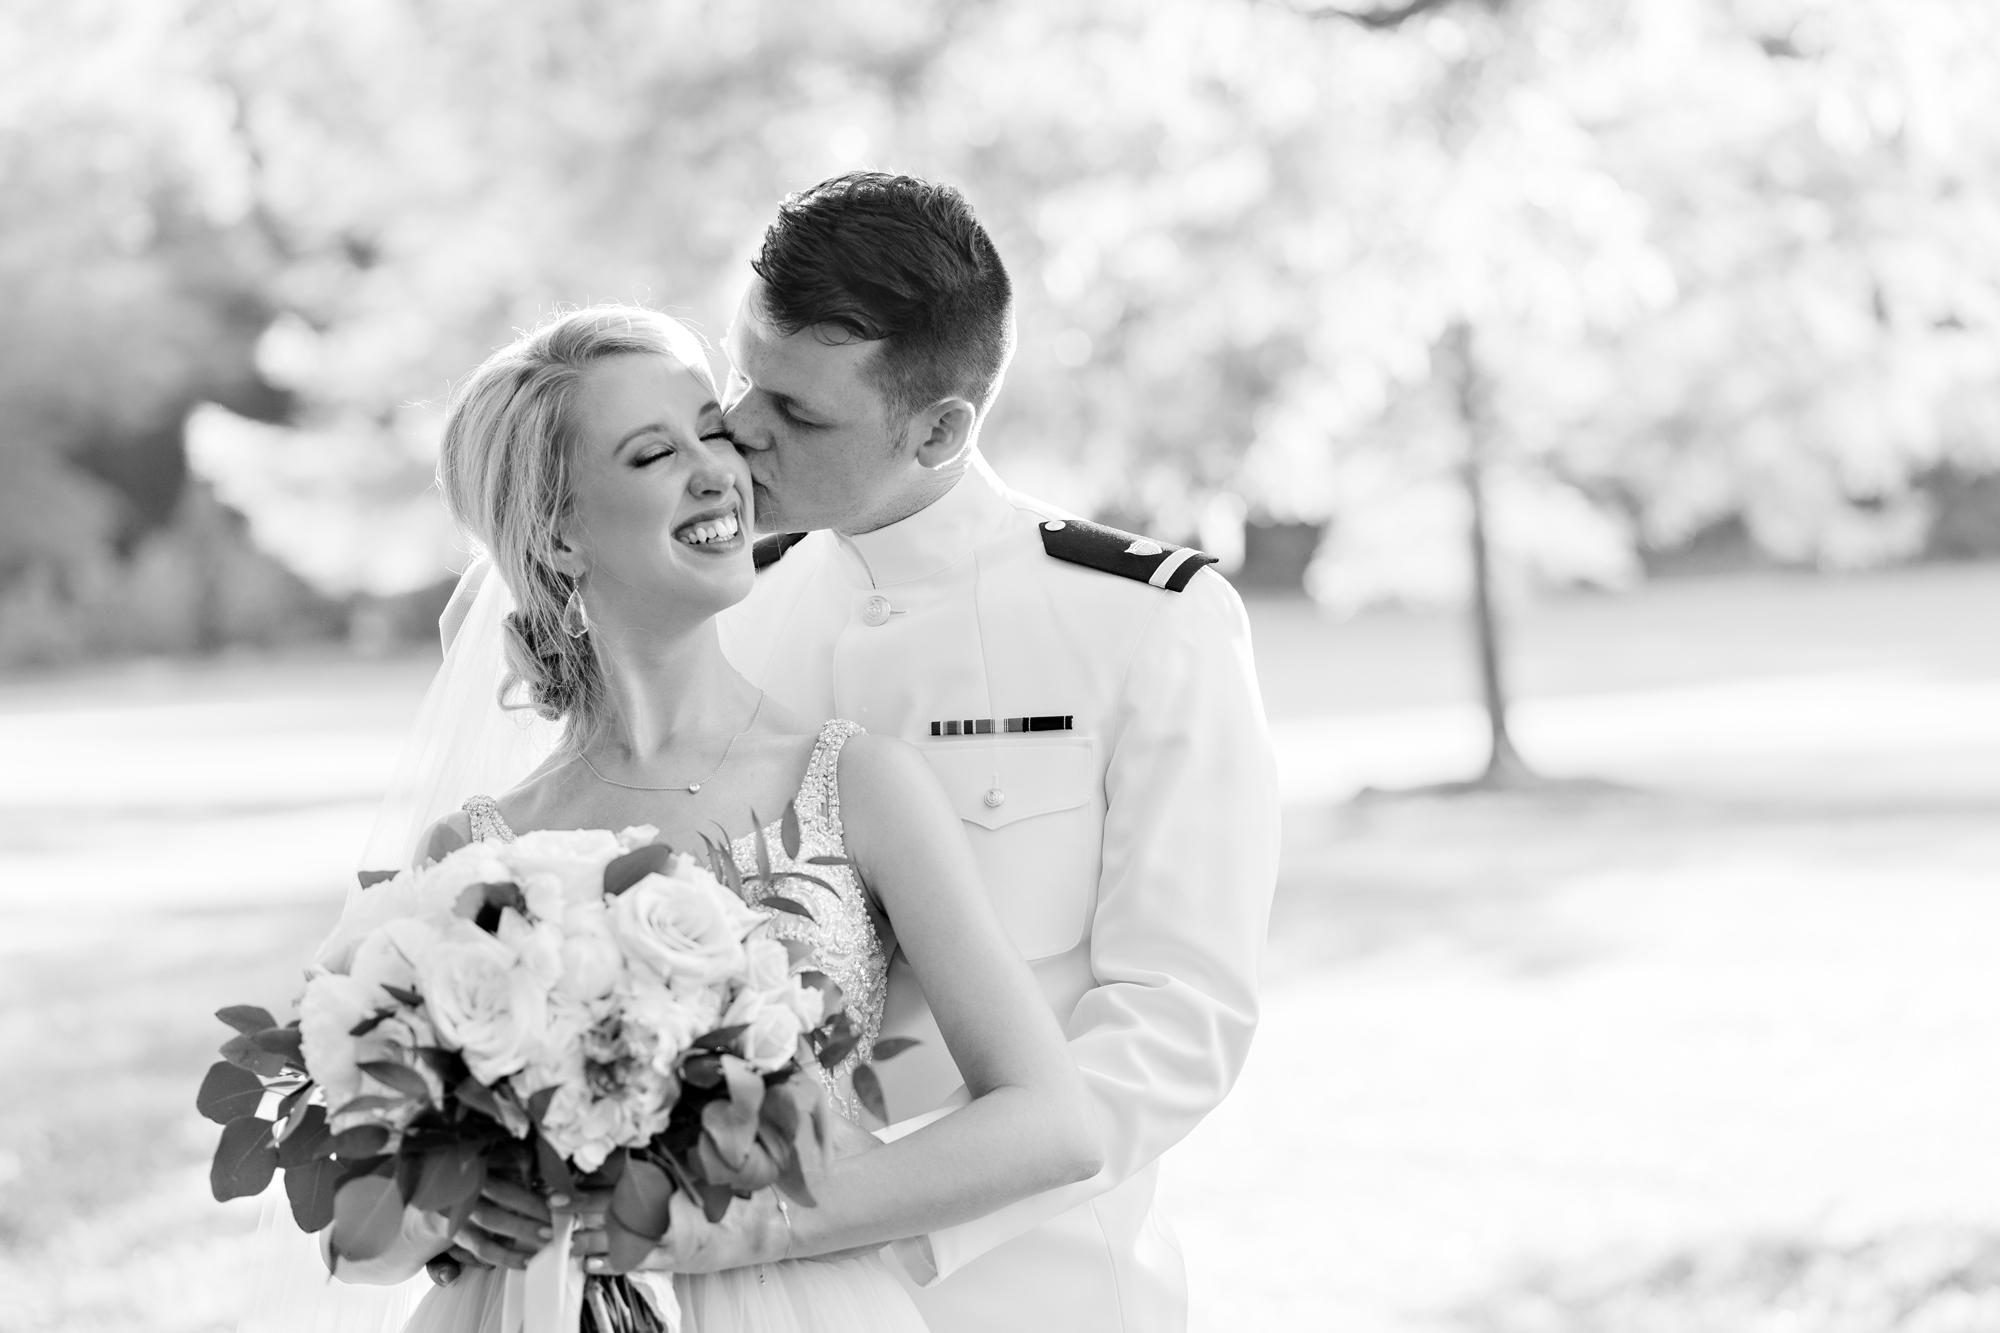 Alabama-Photographers-Nick-Drollette-Wedding-Photography-149.jpg